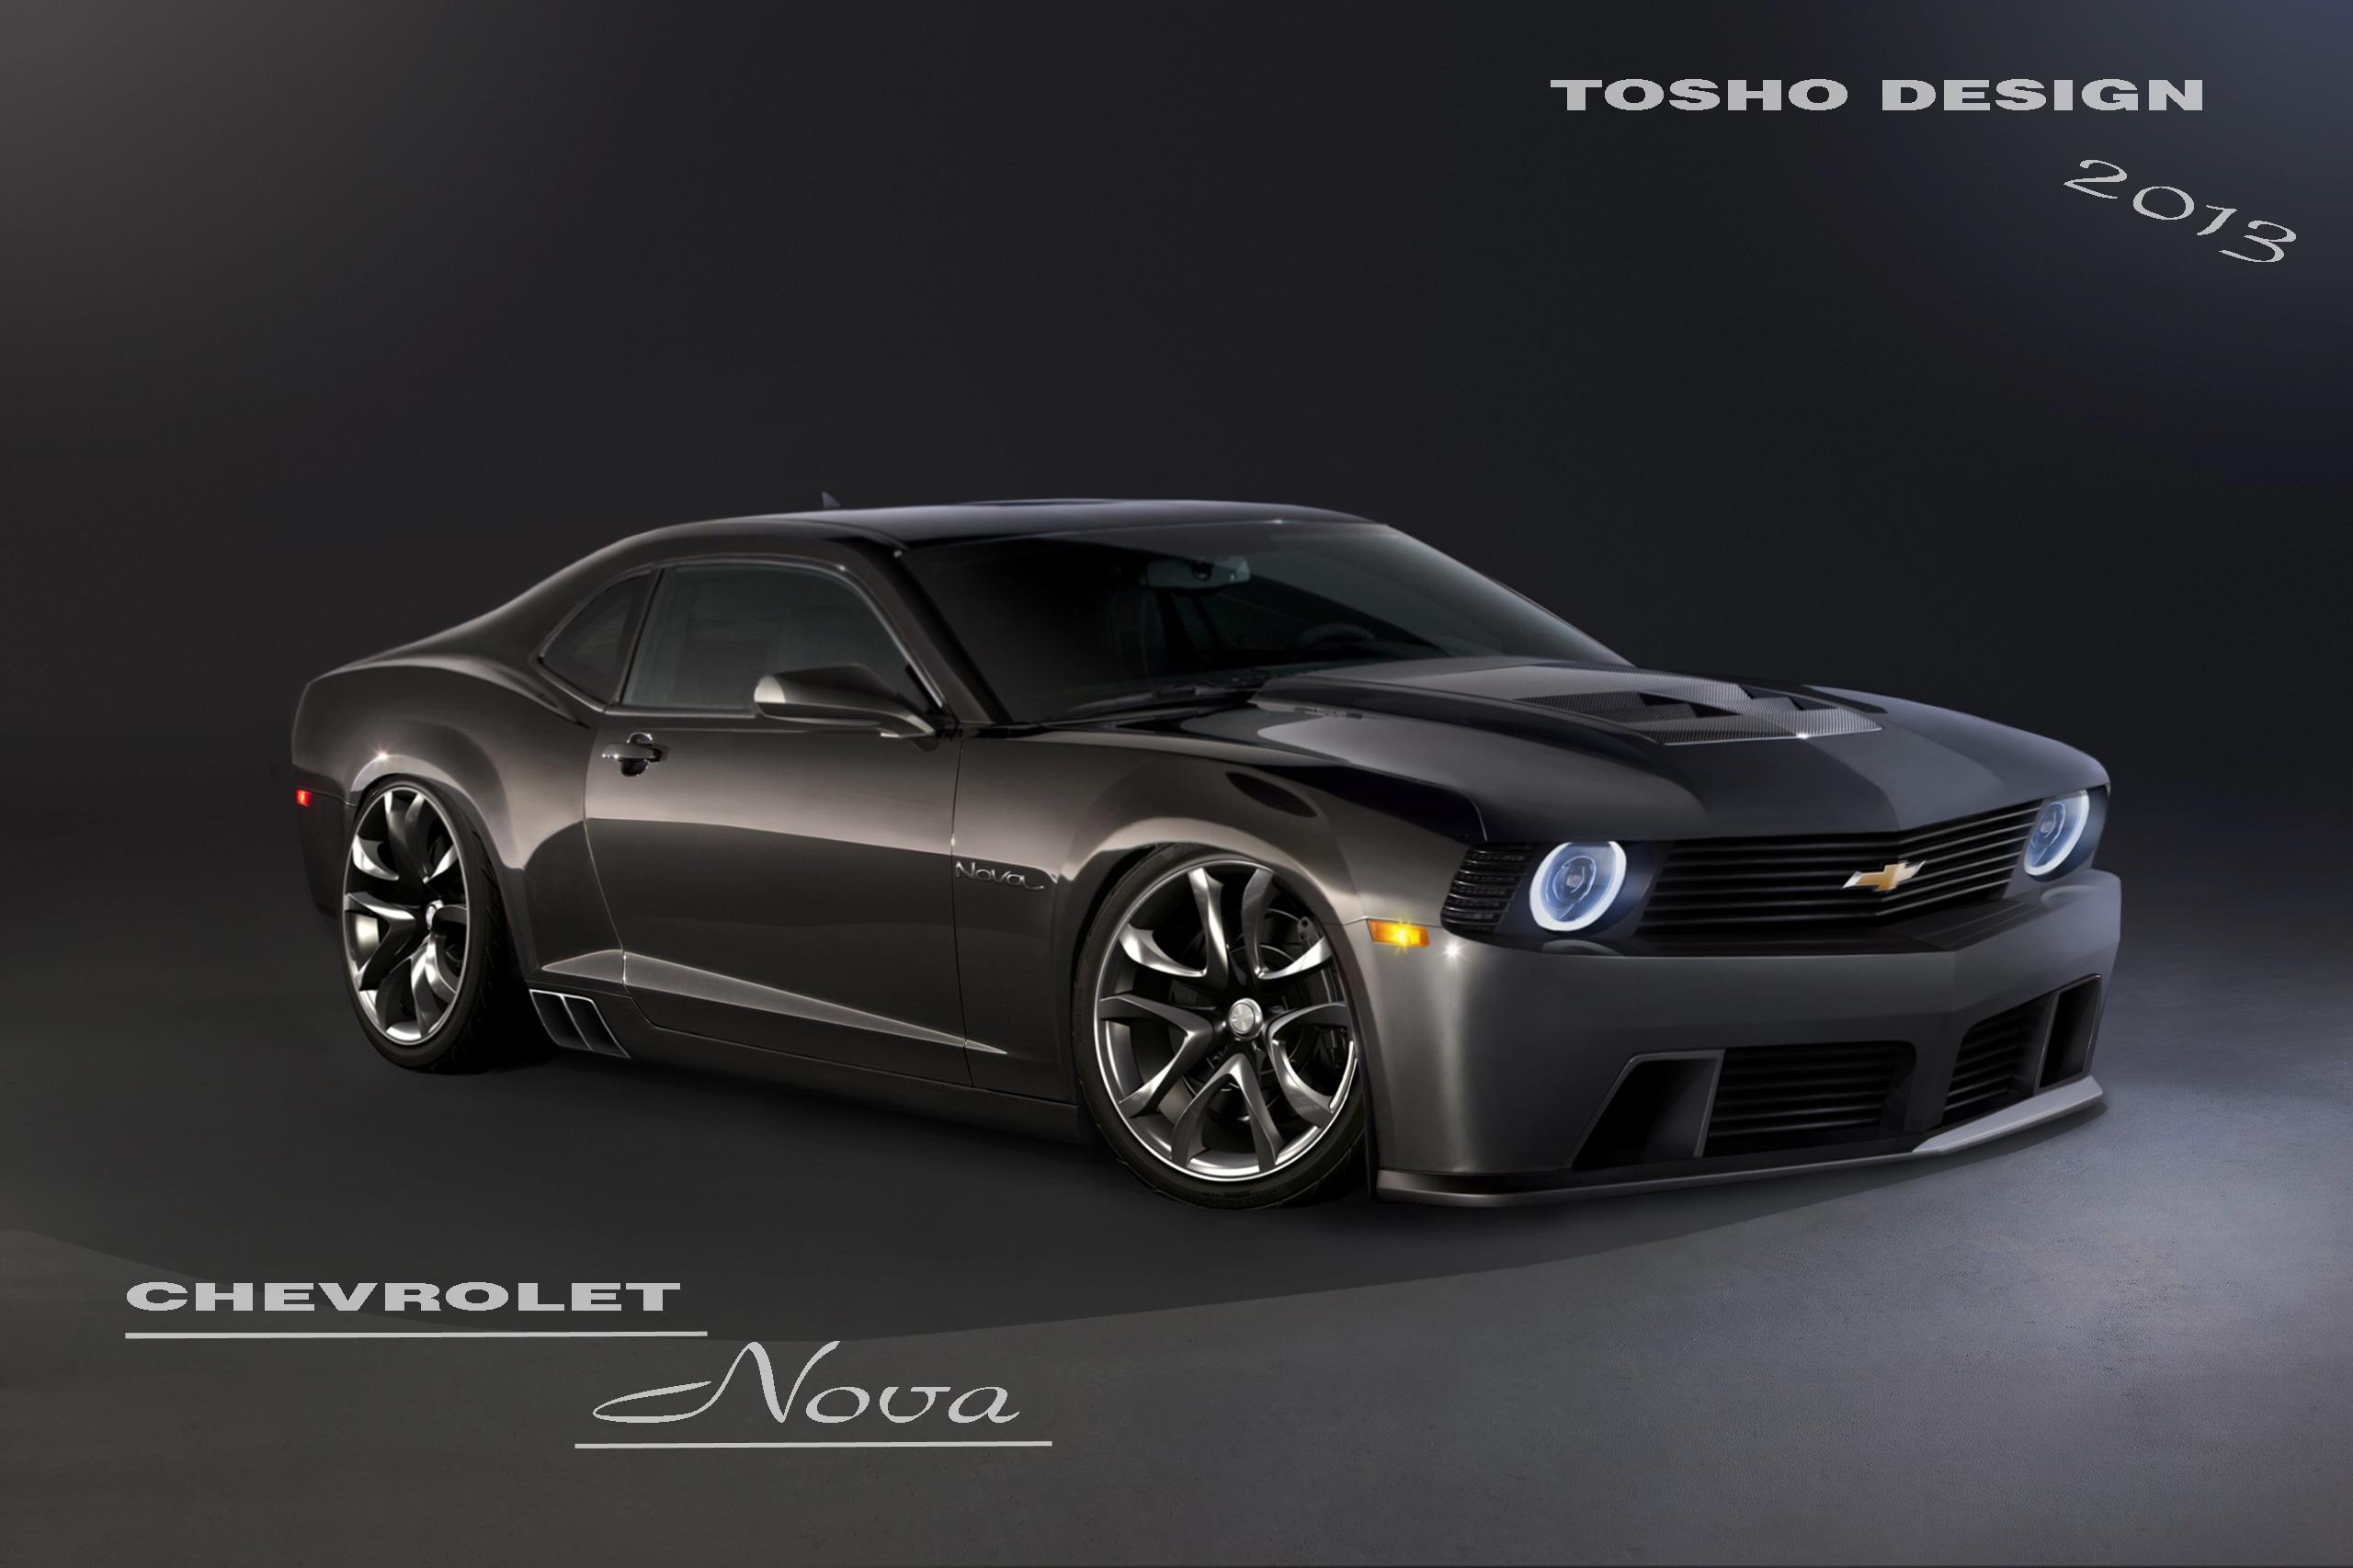 2015 Chevy Nova Concept Nova concept finish by